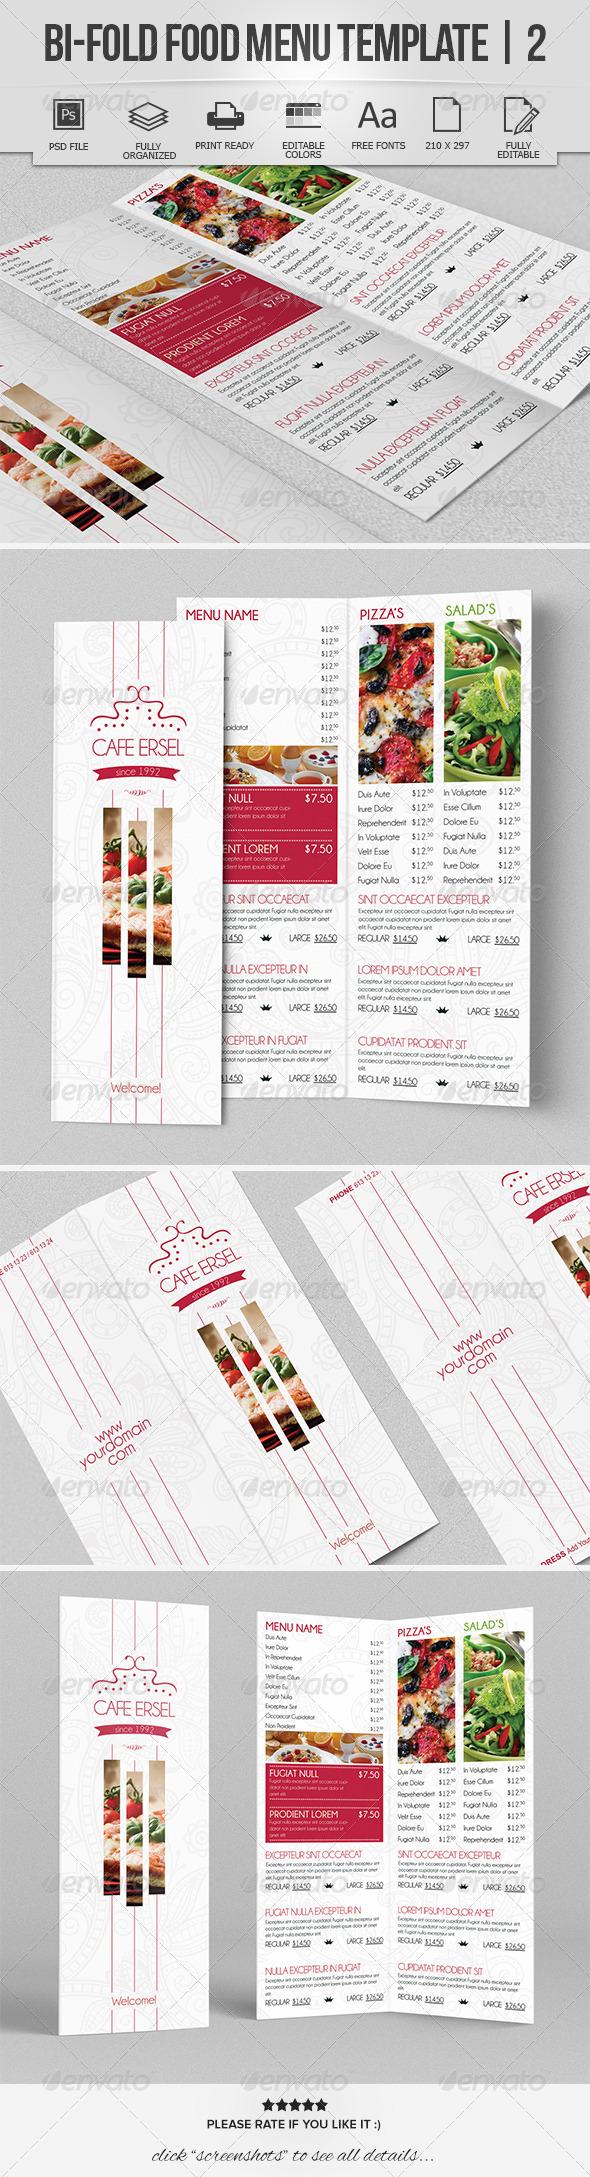 GraphicRiver Bi-Fold Food Menu Template 2 7666471